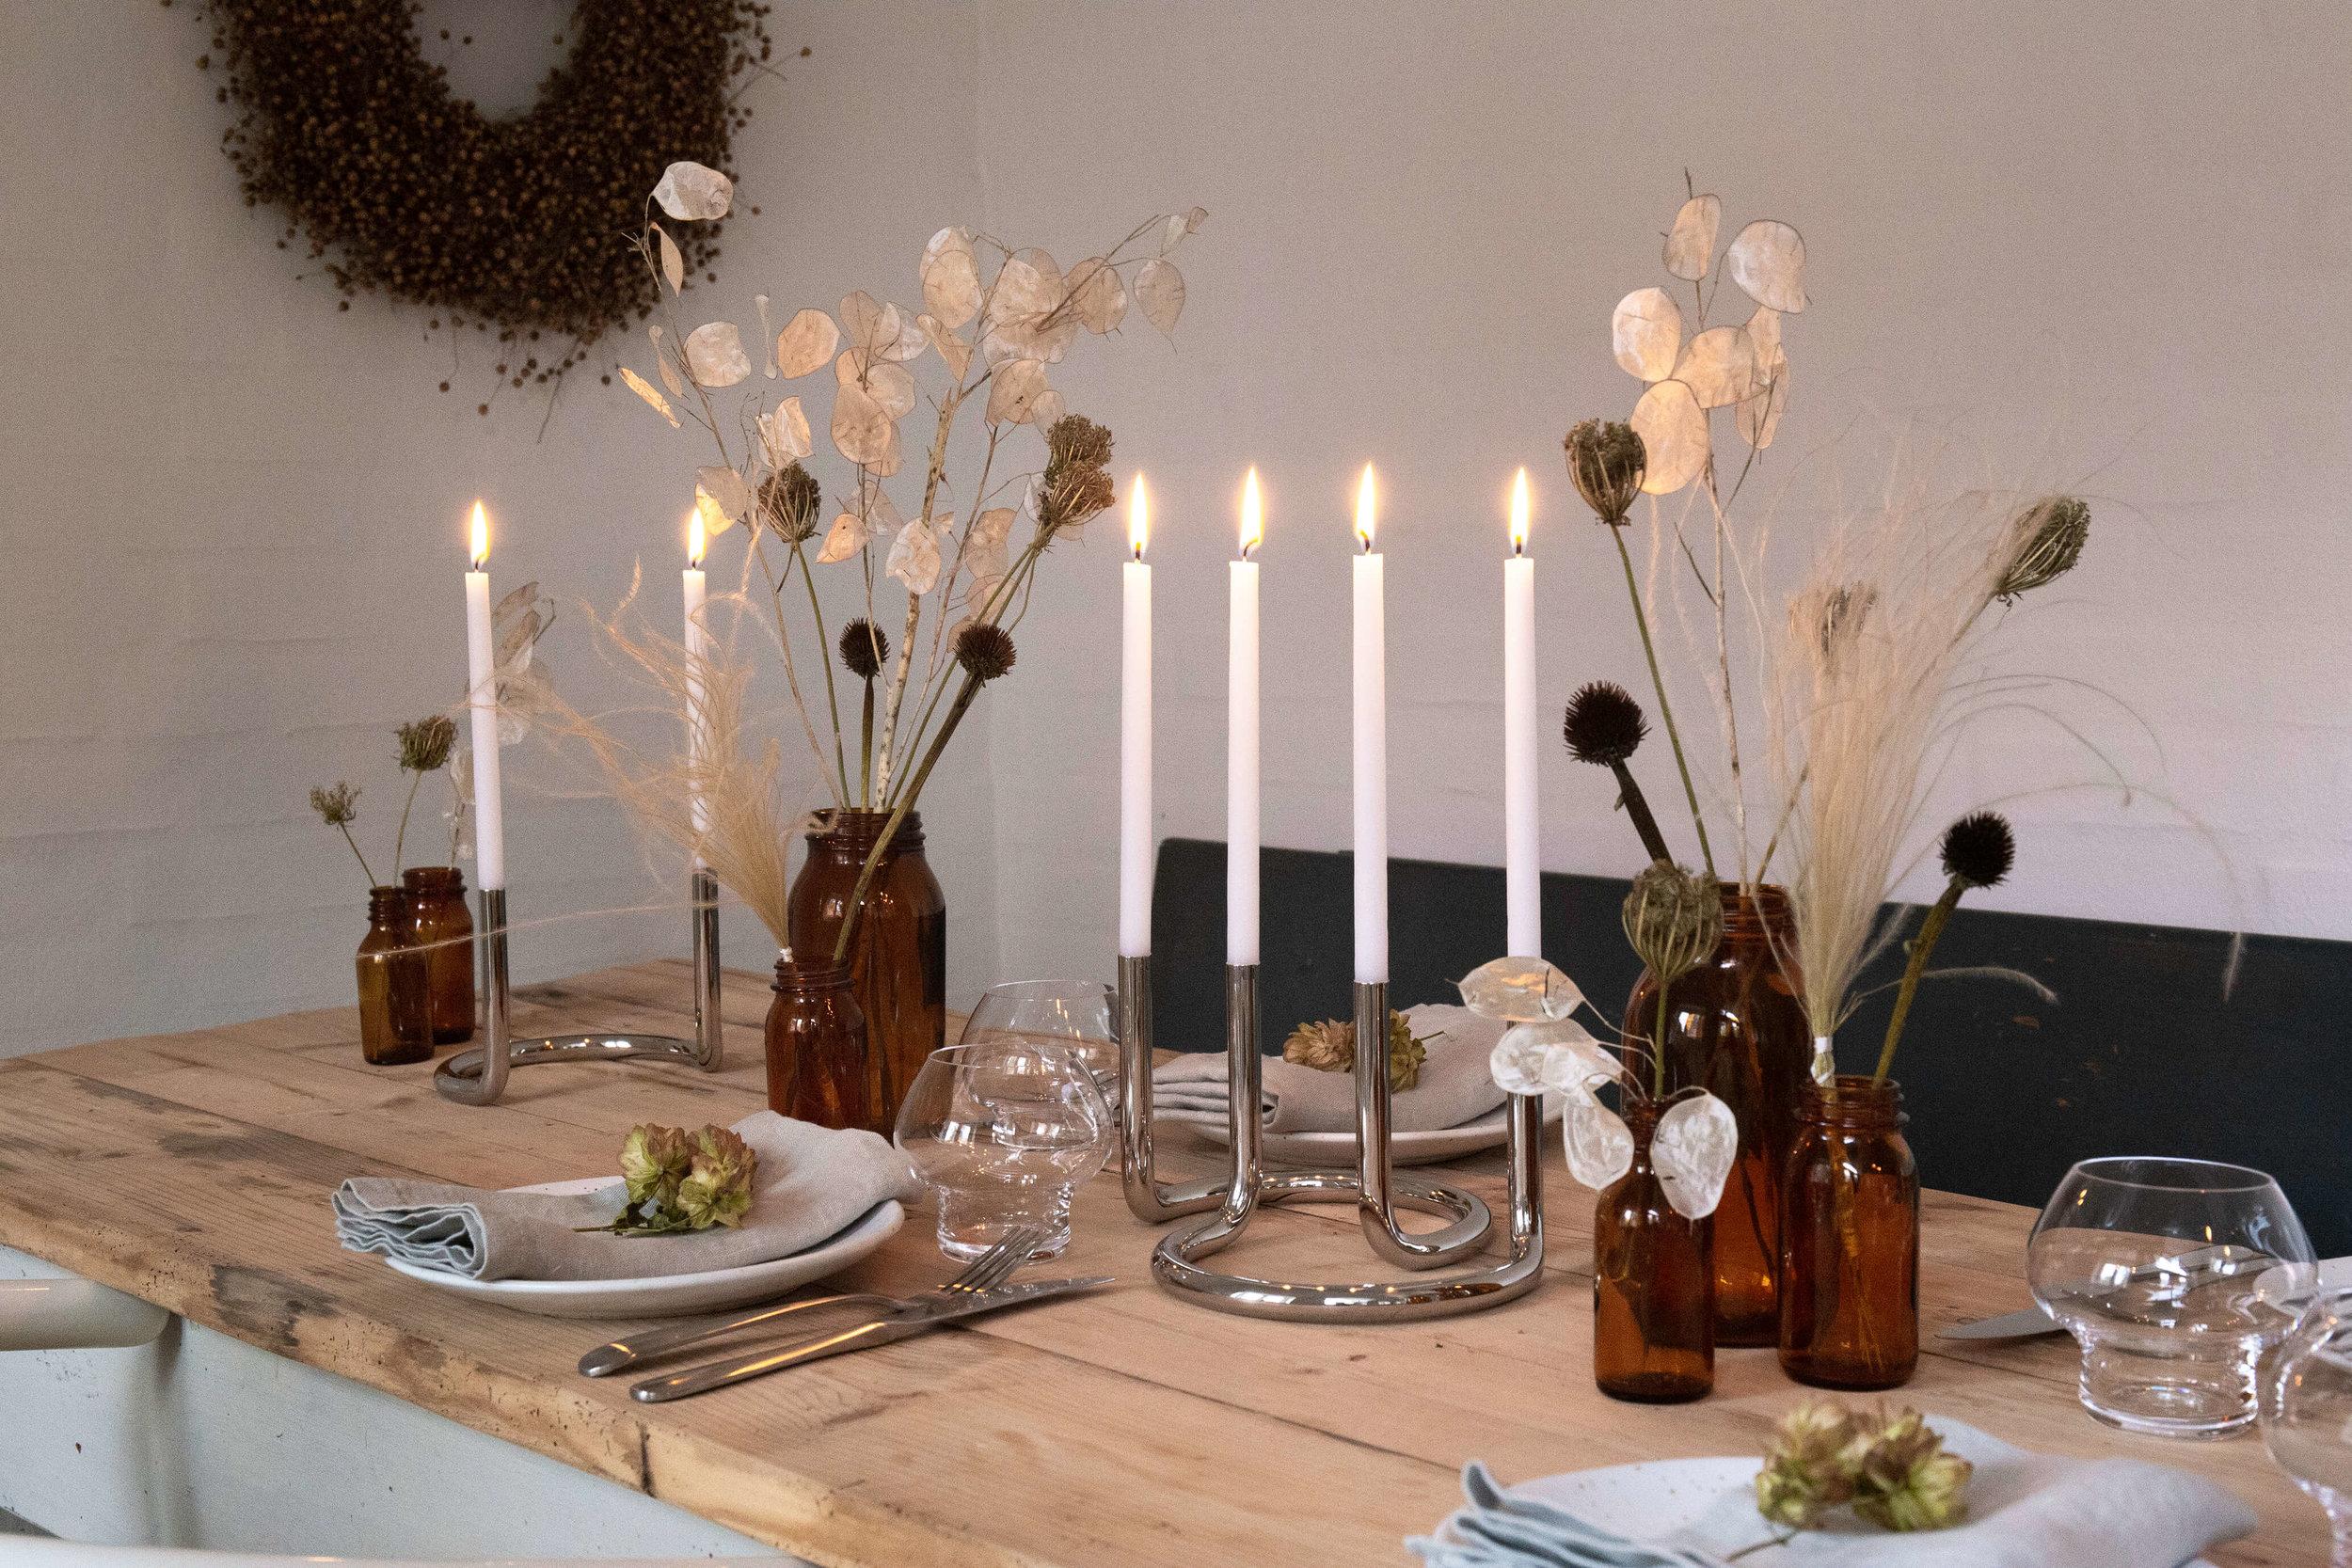 Architectmade Peter Karpf 'Gemini' Candle Holders